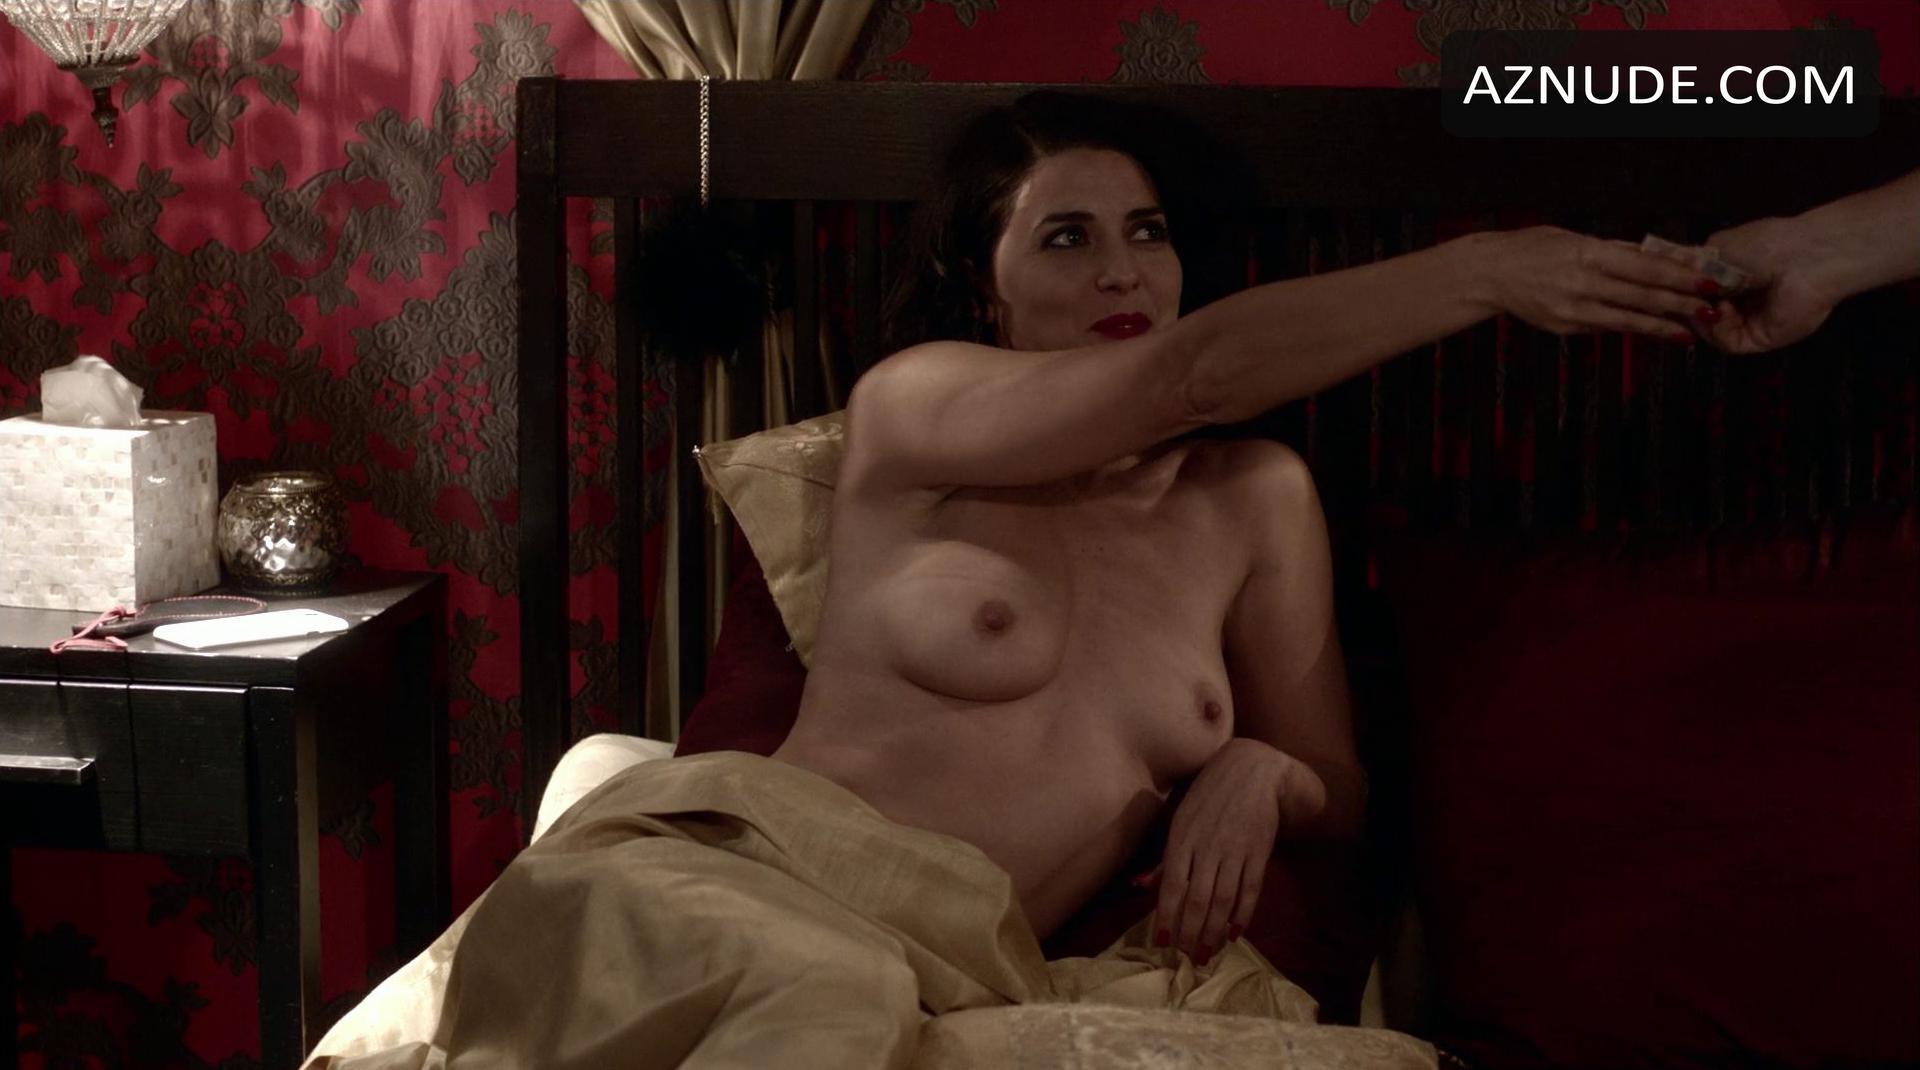 Ruth vega fernandez kiss me - 1 part 8